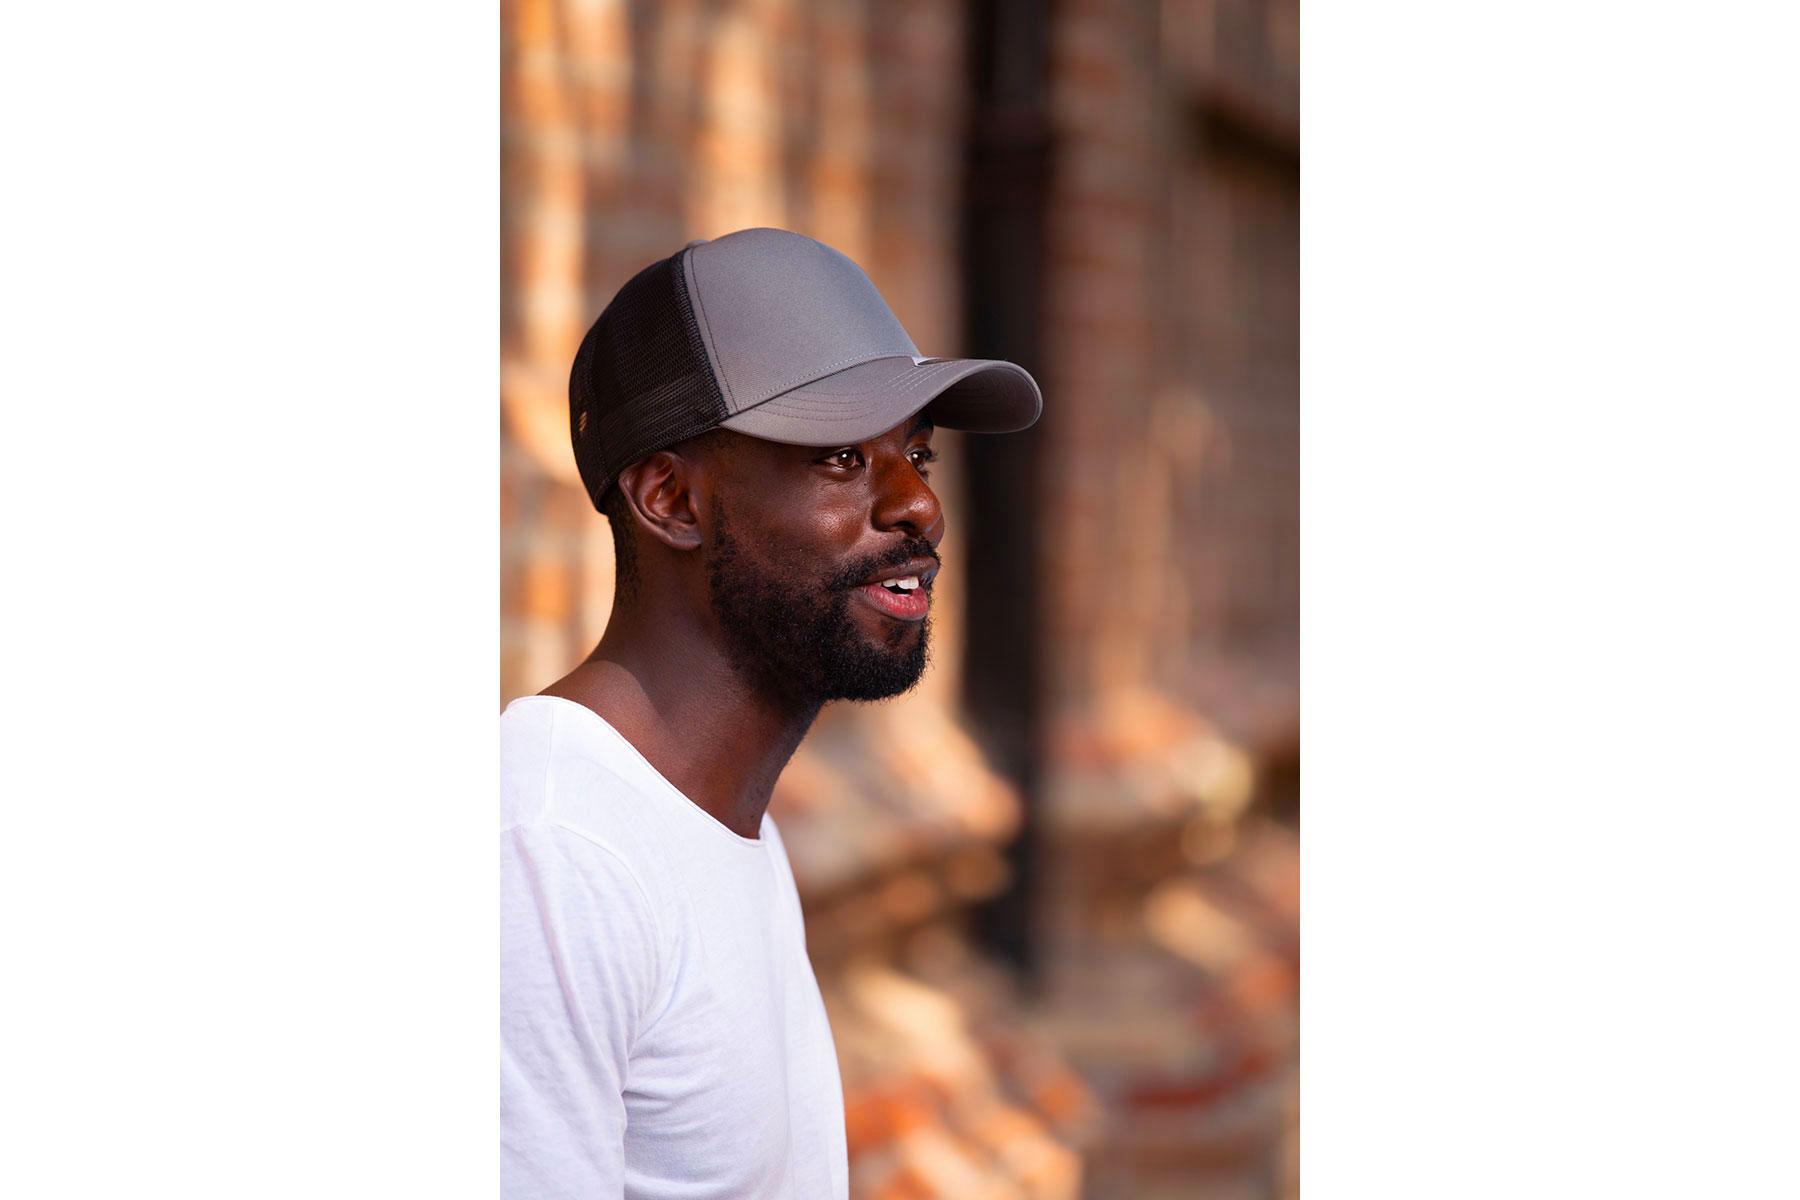 Rapper Recycled Verkkolippis - NEW 2019 ATLANTIS CAPS & HATS - RARE - 1